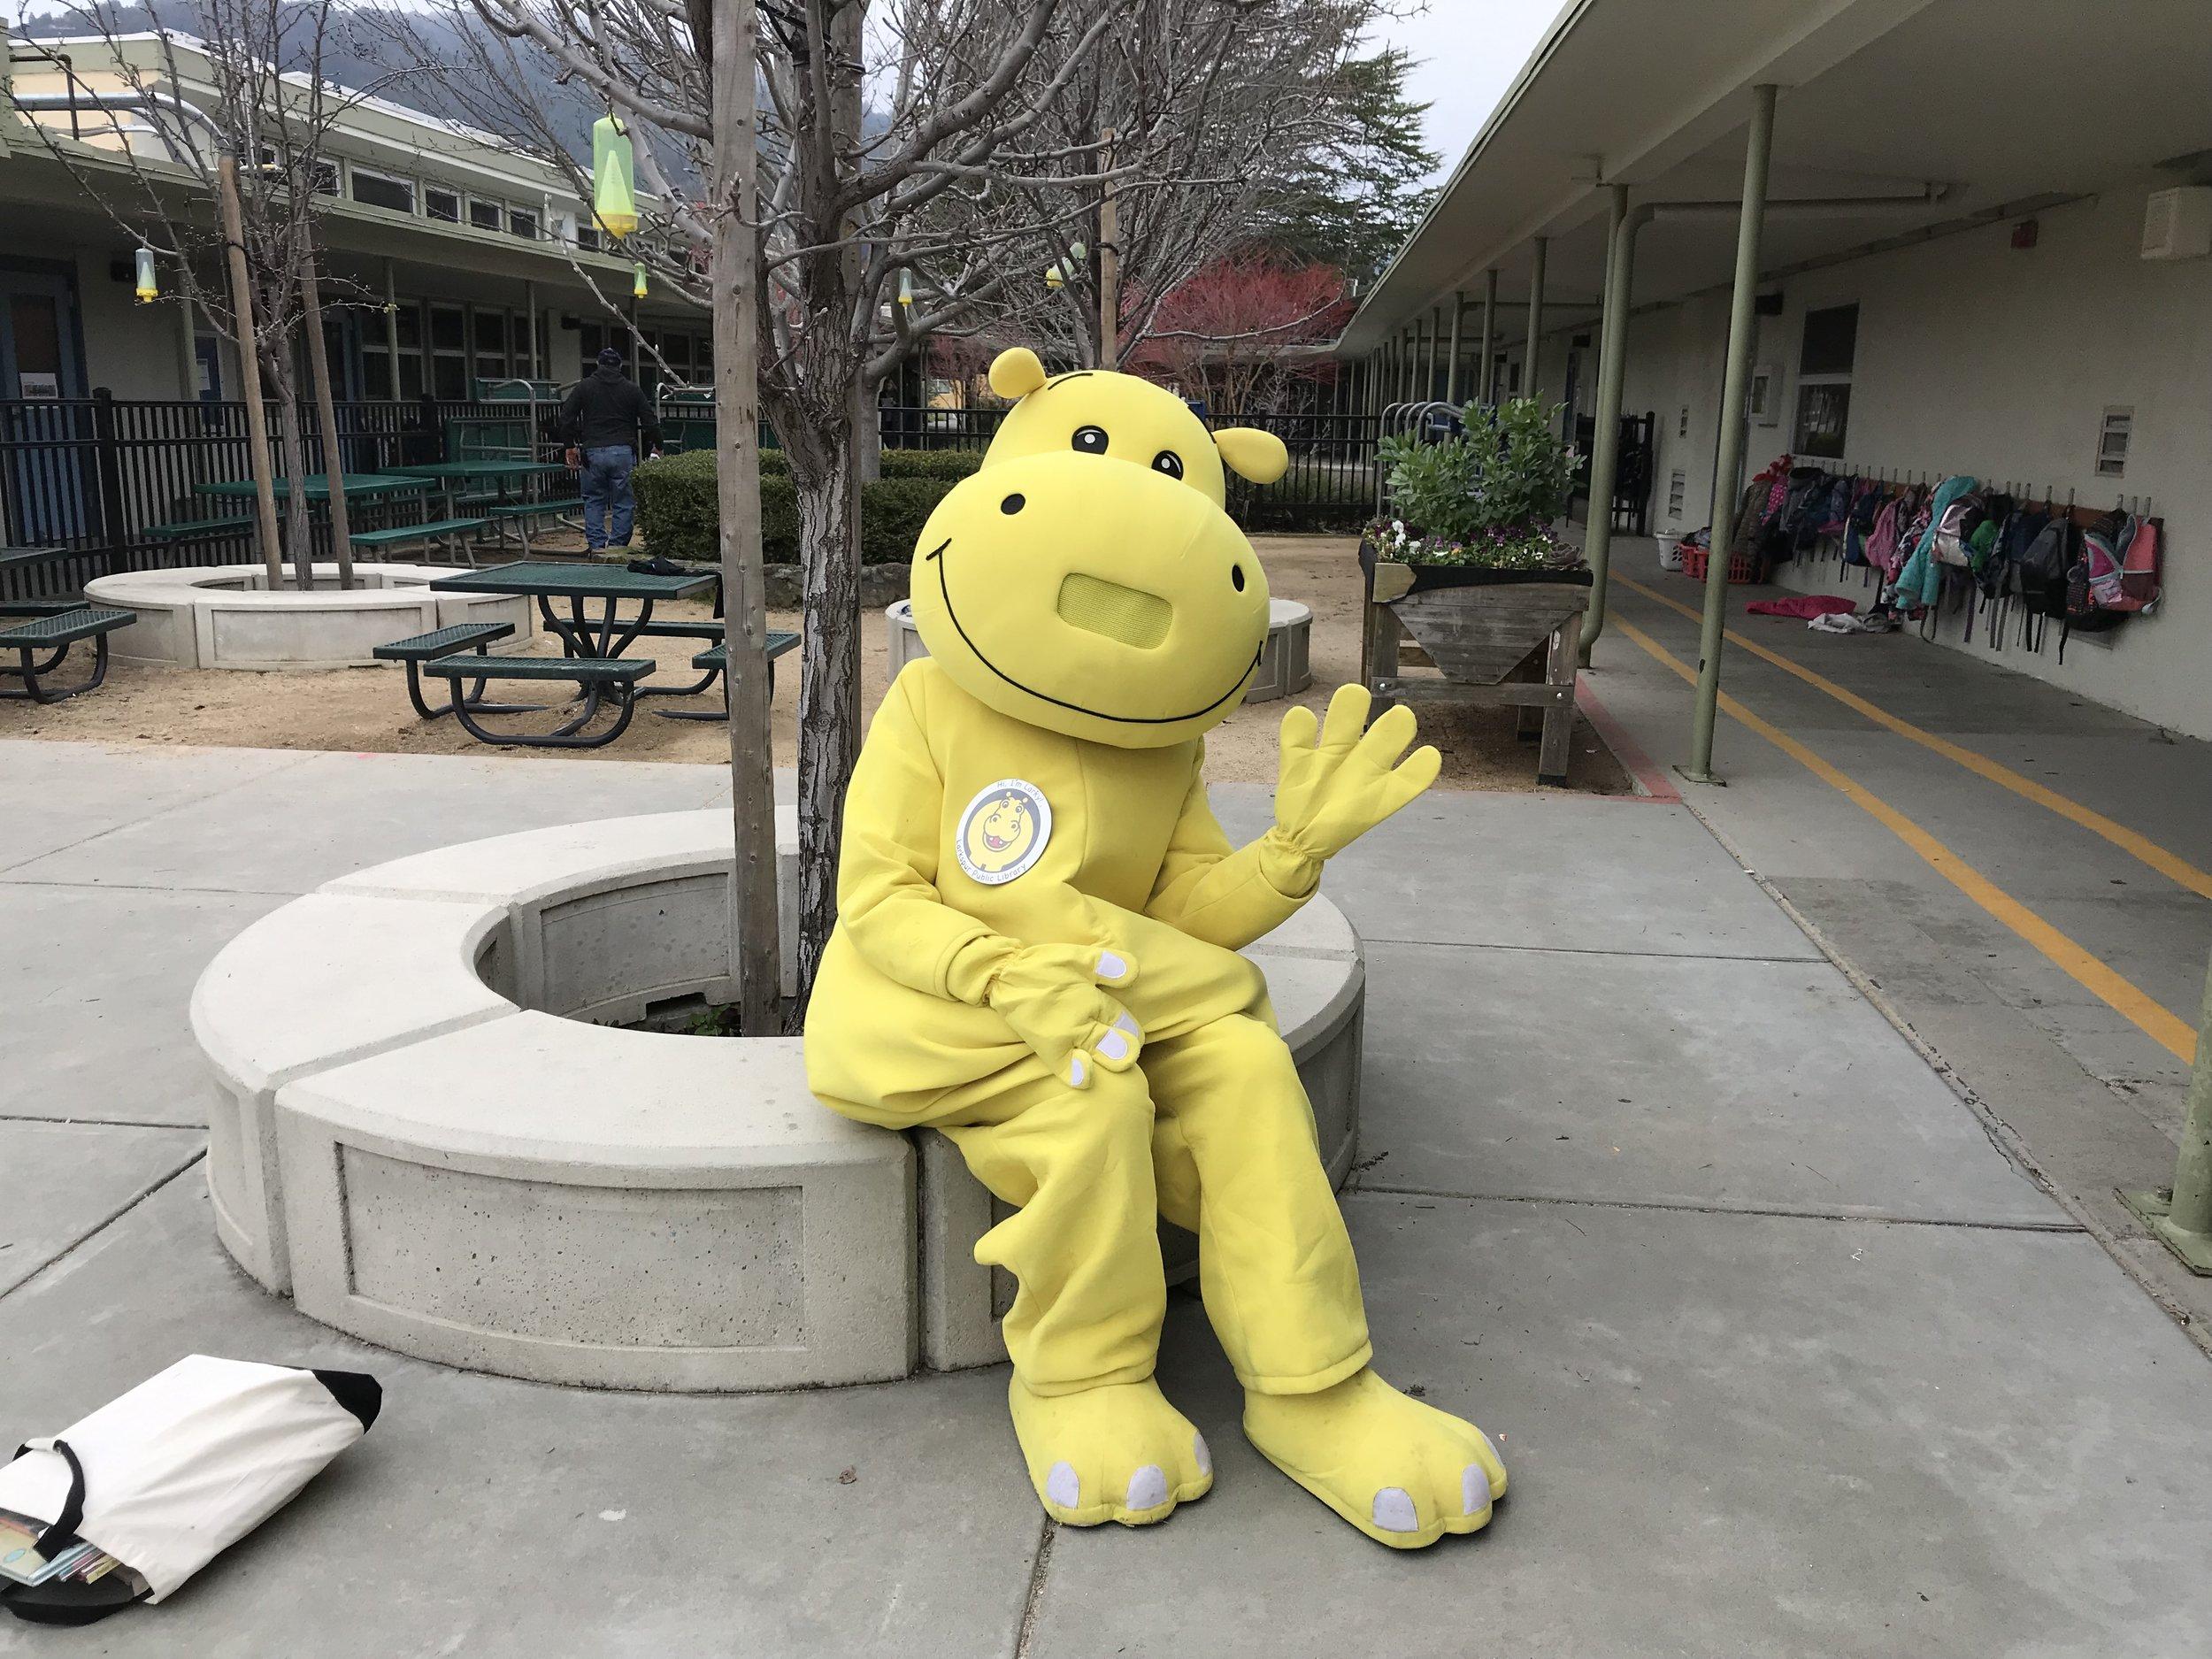 Visit to Neil Cummins Elementary School - January 2019